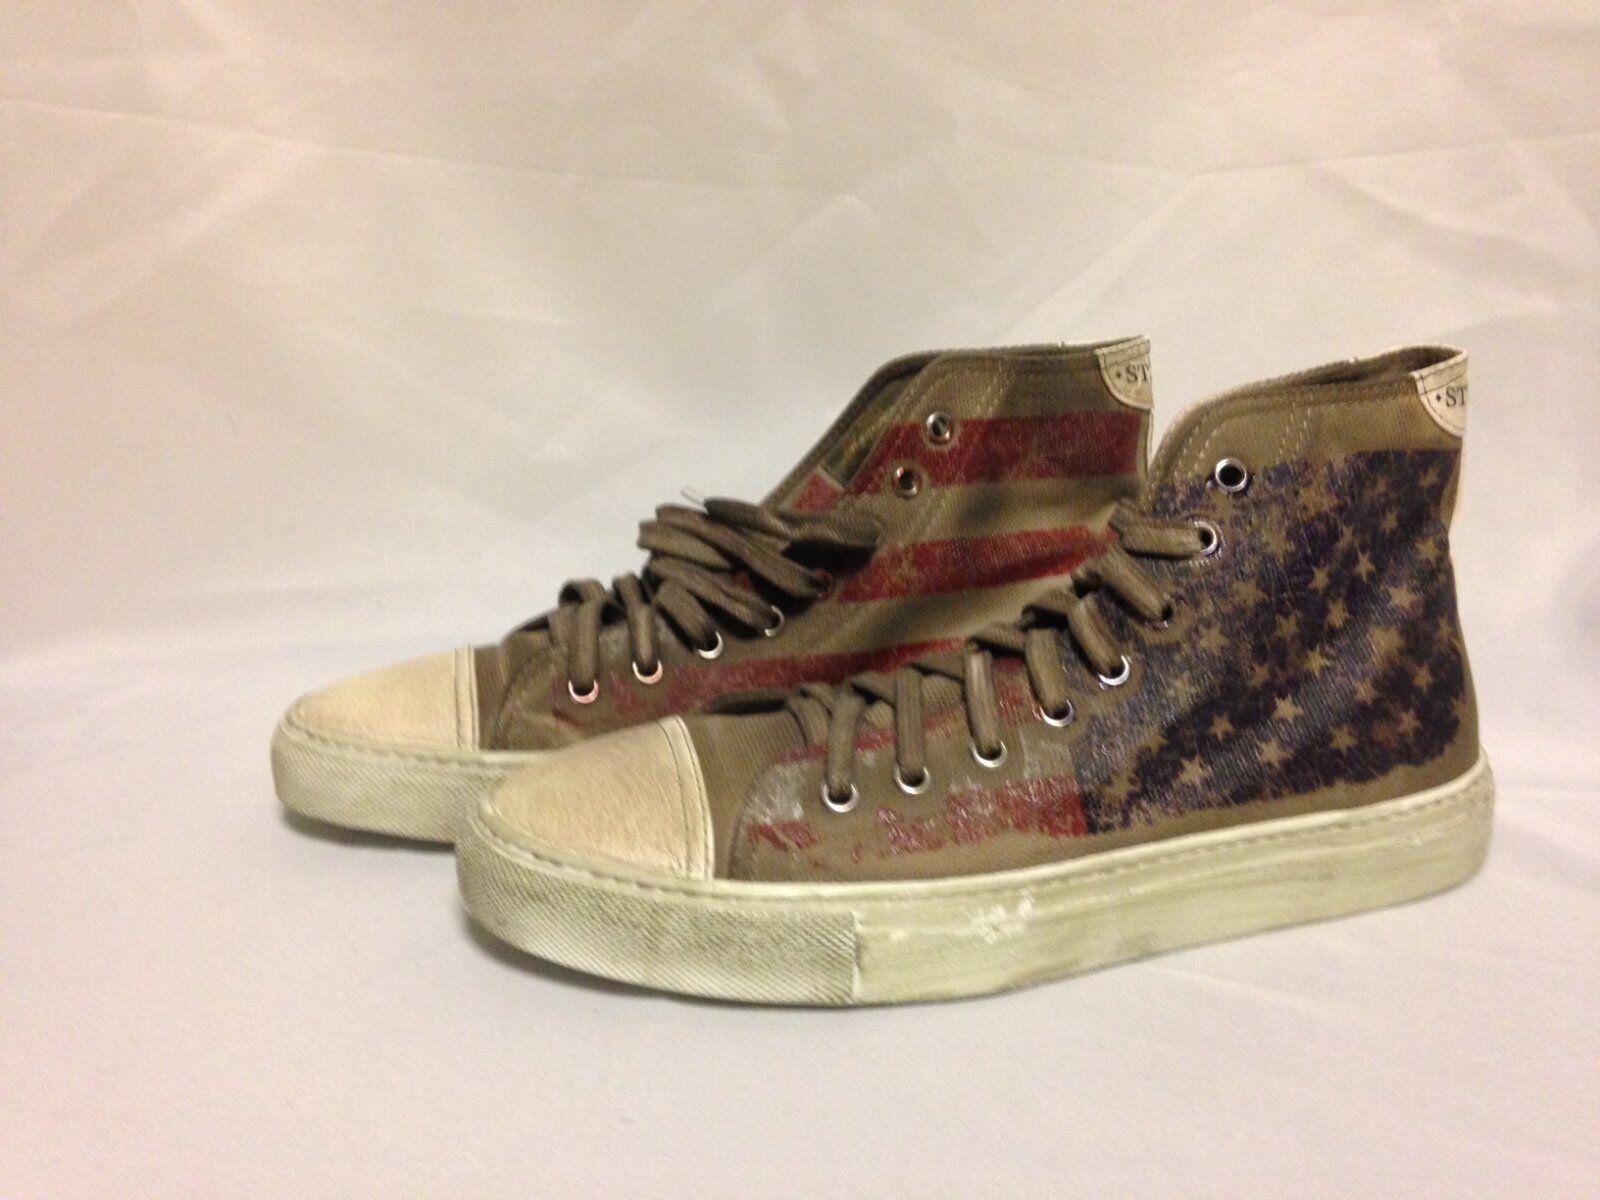 Studswar American  Round Toe Canvas Distributed High scarpe da ginnastica Chalk Cotton NWB  benvenuto a comprare